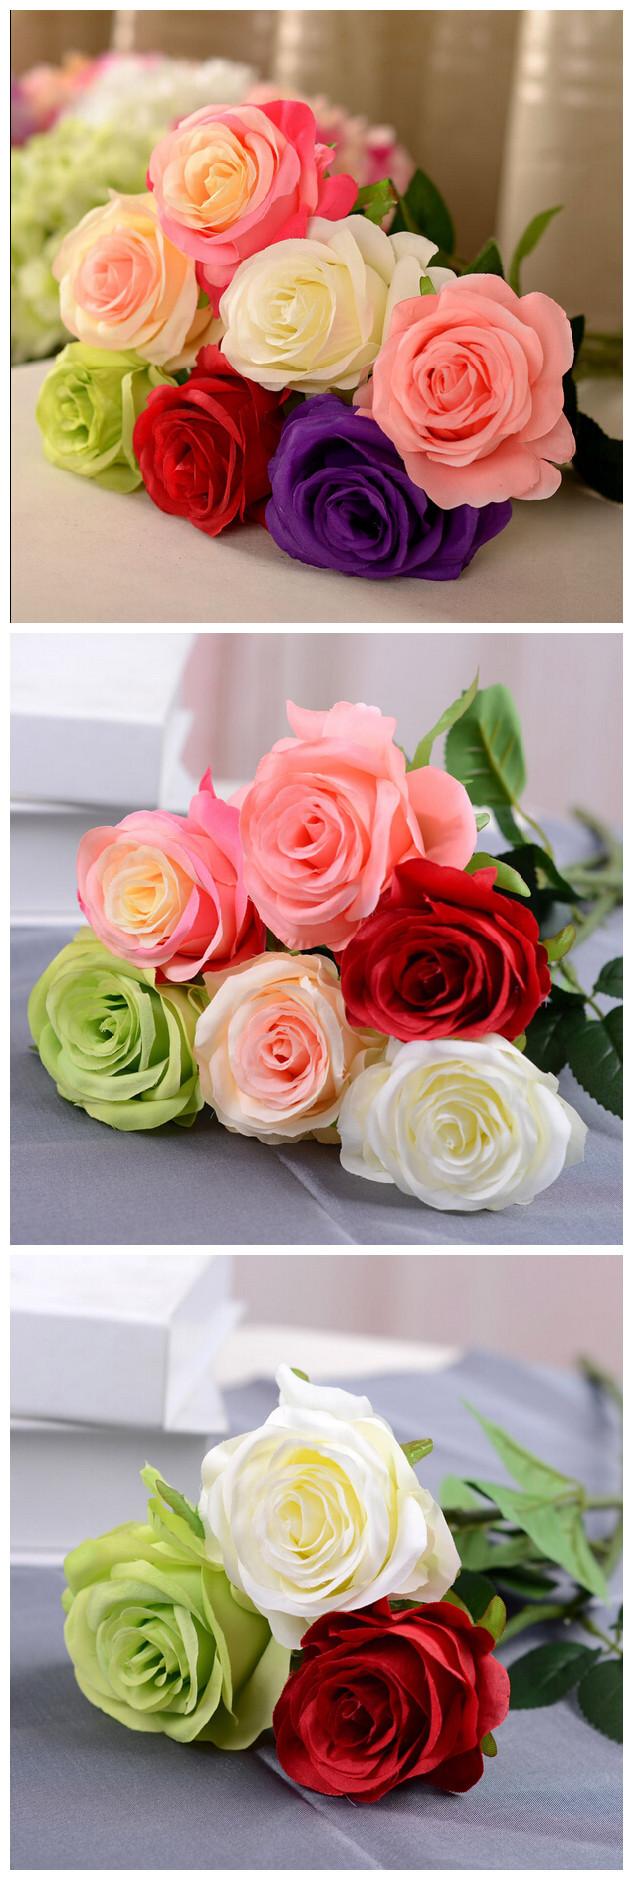 Cheap wholesale fake artificial plastic fake flower rose for sale cheap wholesale fake artificial plastic fake flower rose for sale home wedding decoration izmirmasajfo Choice Image